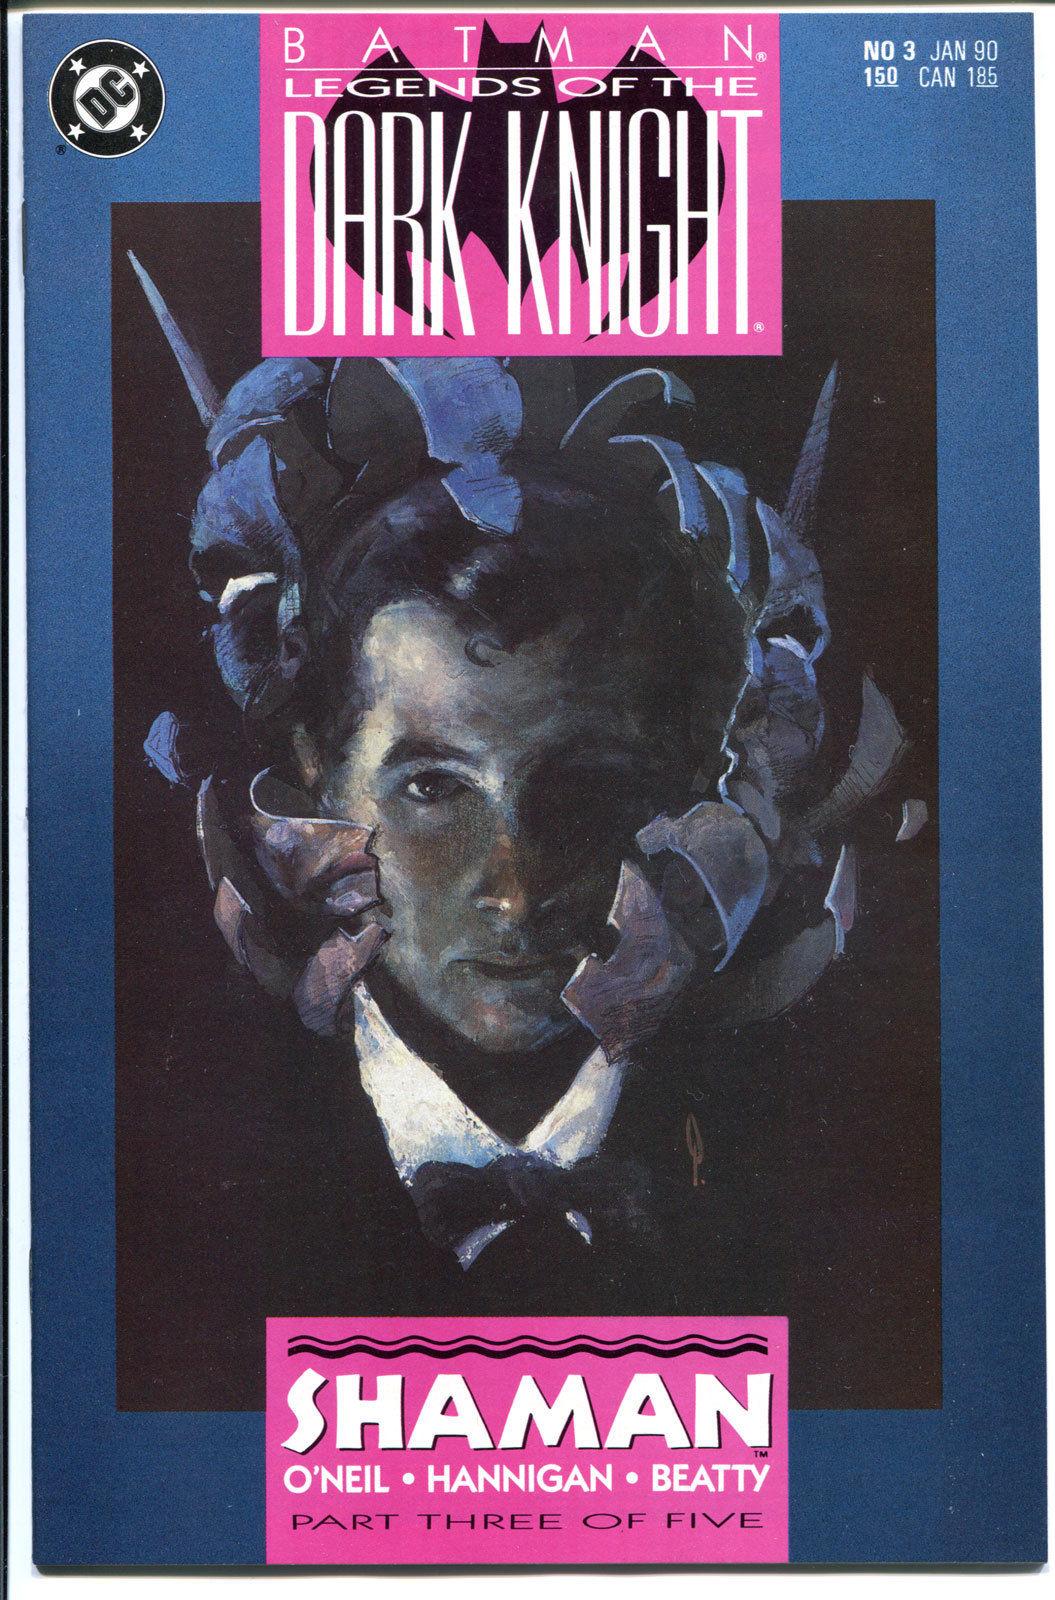 BATMAN: LEGENDS OF THE DARK KNIGHT #3, Shaman, 1989,NM+